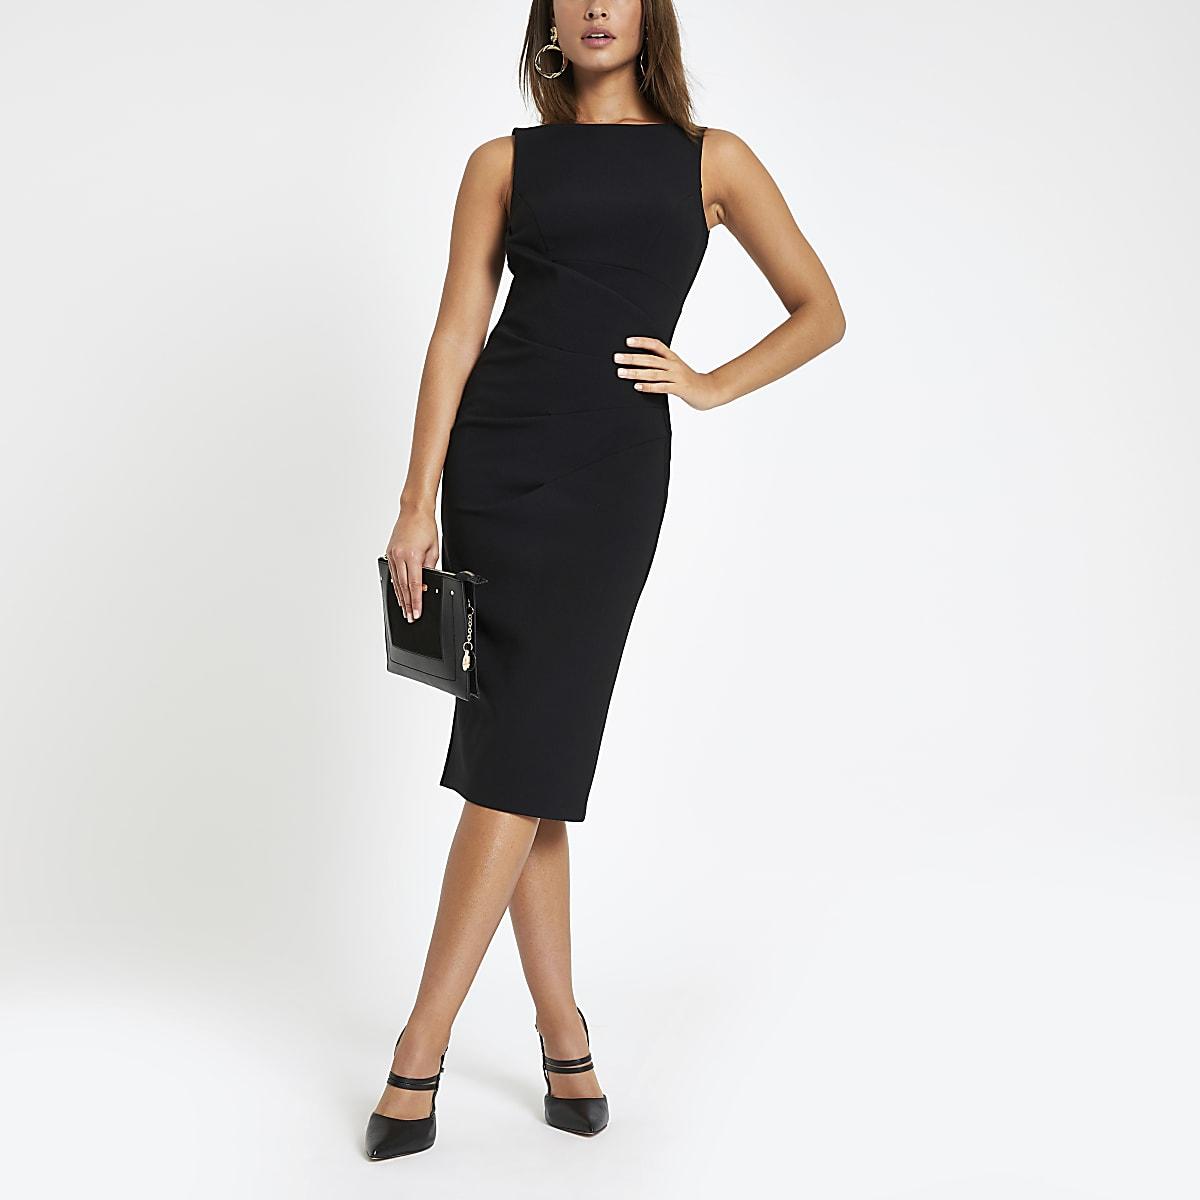 Black bodycon midi dress